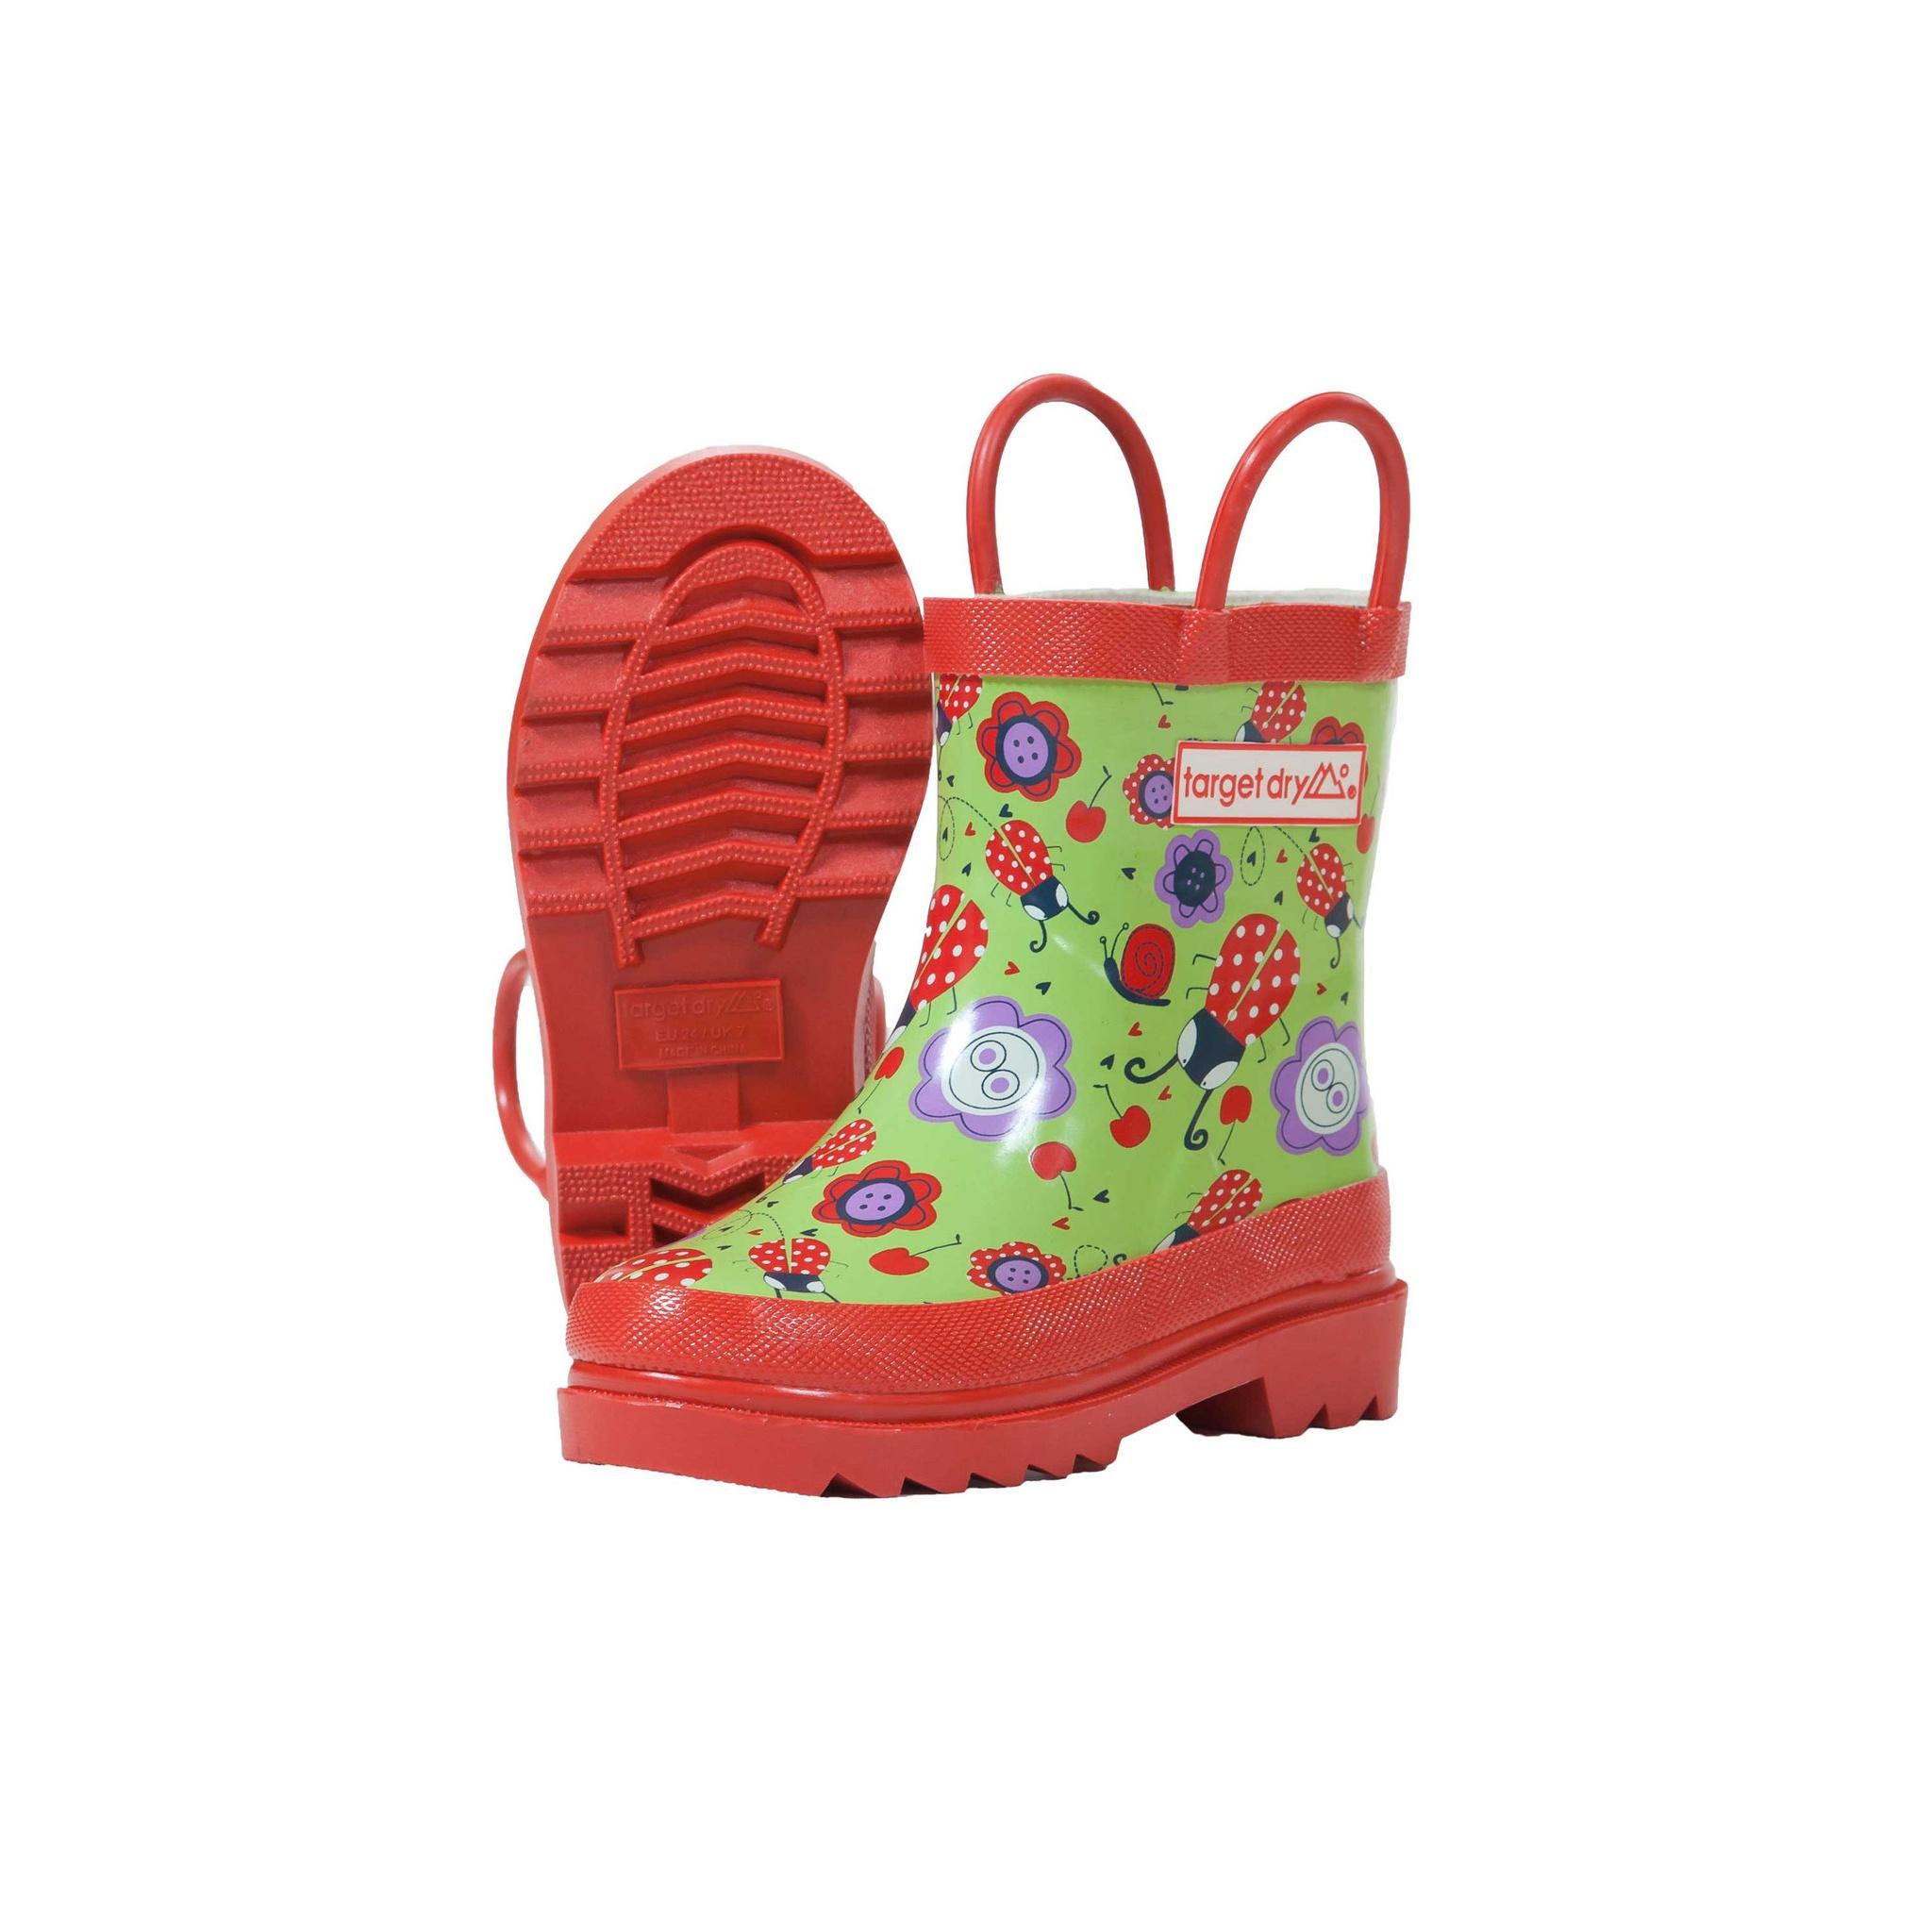 Target Dry Para Niños Niñas Botas Wellington Patrón Floral Ladybird